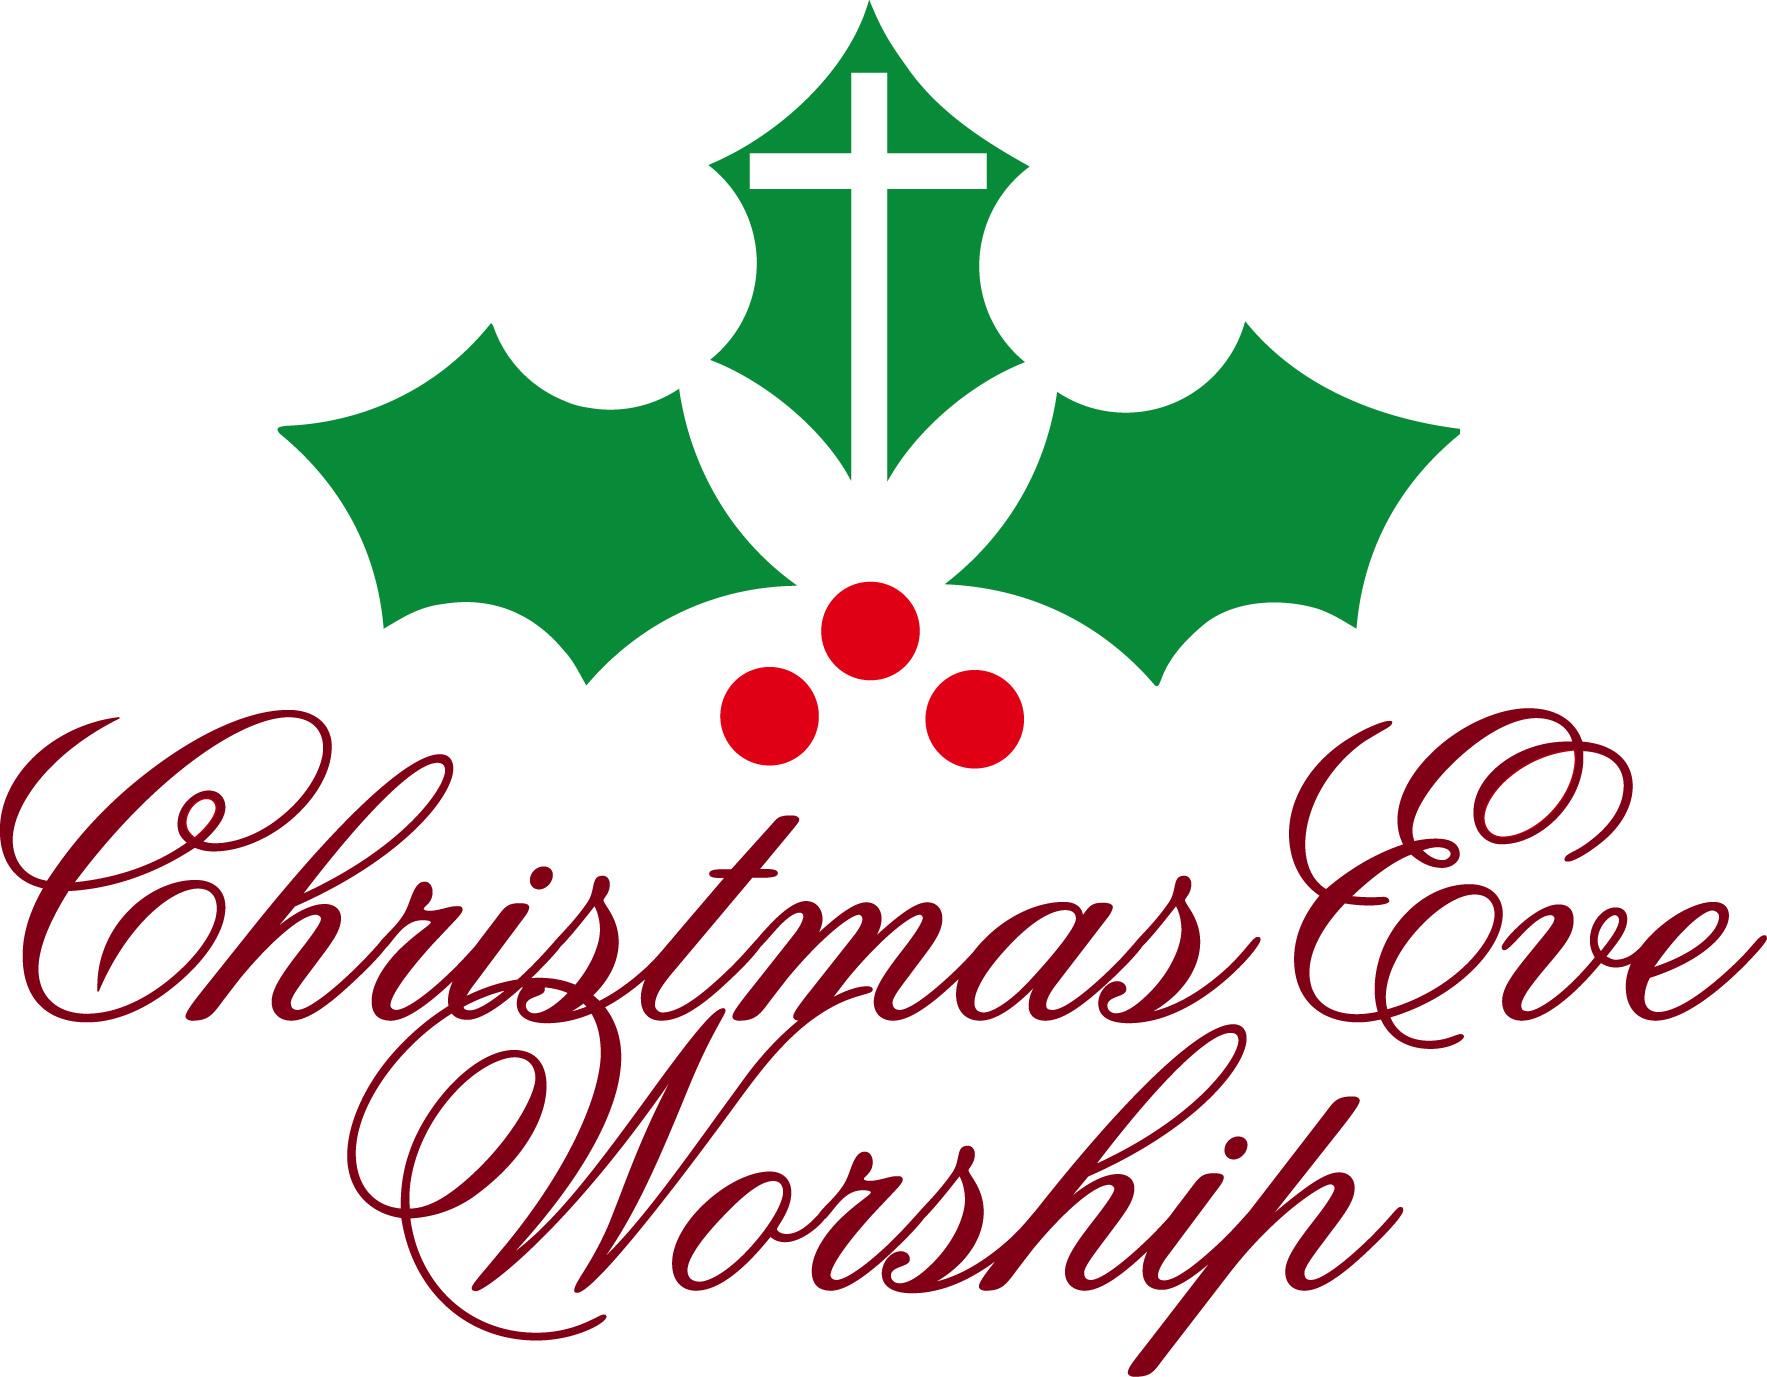 Worship Service Clip Art.